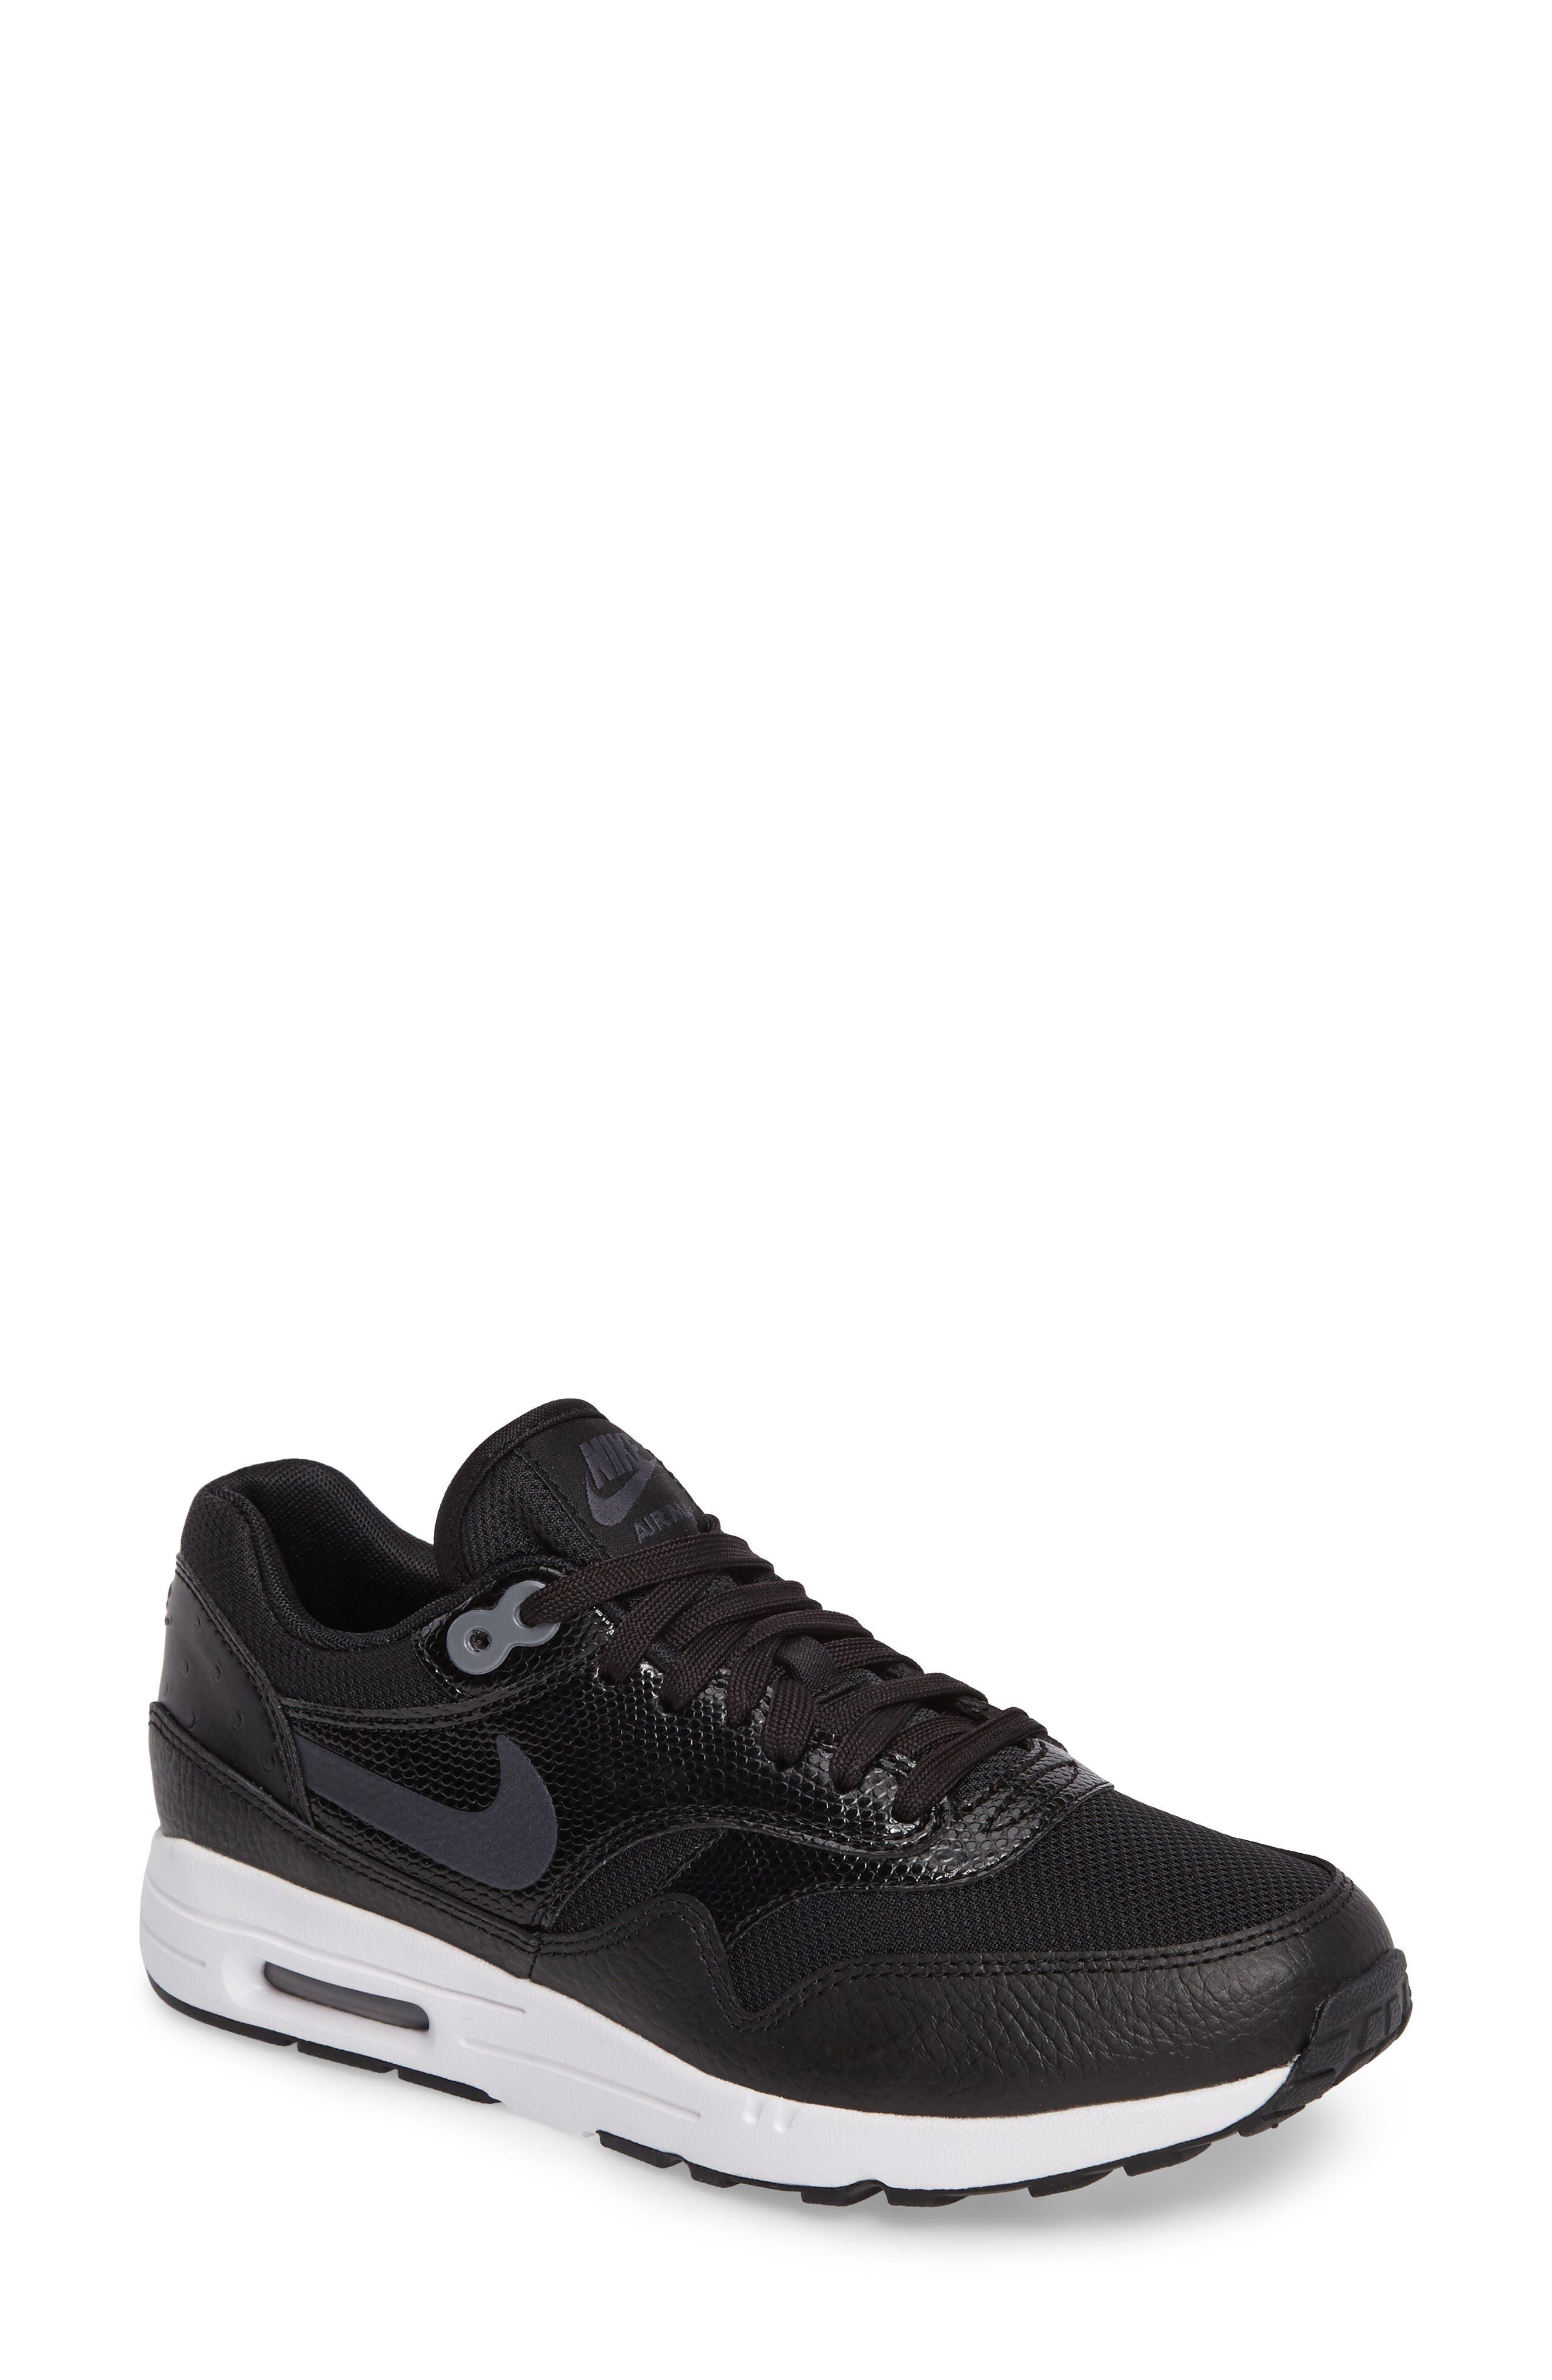 Air Max 1 Ultra 2.0 Running Shoe,                         Main,                         color, Hematite/ Black/ White